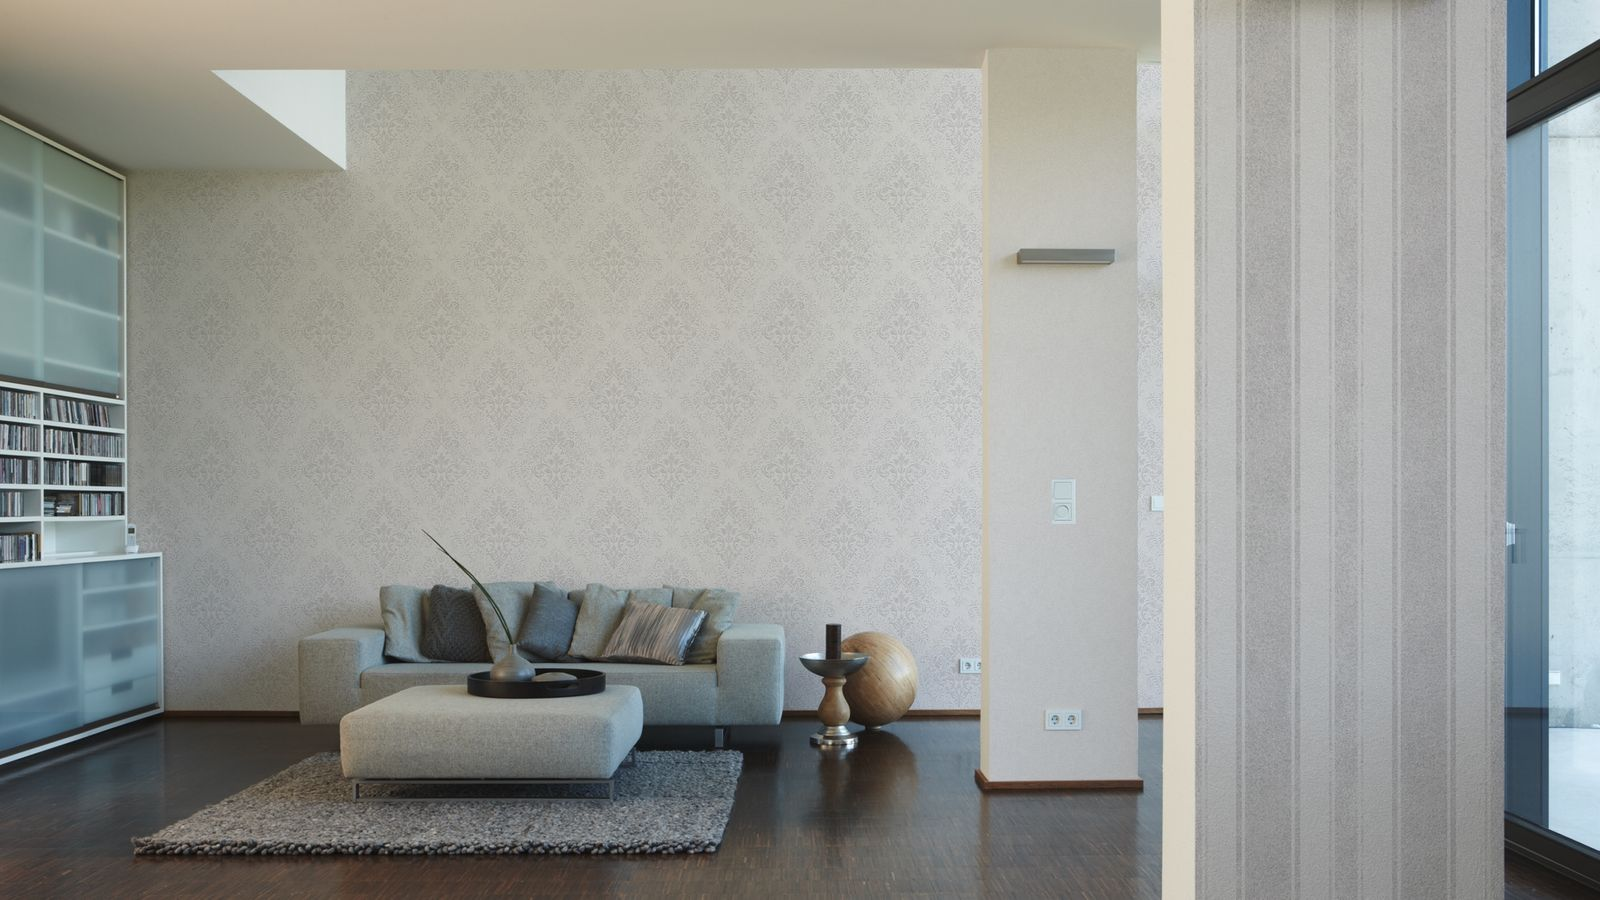 jette joop tapete vlies barock grauwei metallic 33924 6. Black Bedroom Furniture Sets. Home Design Ideas